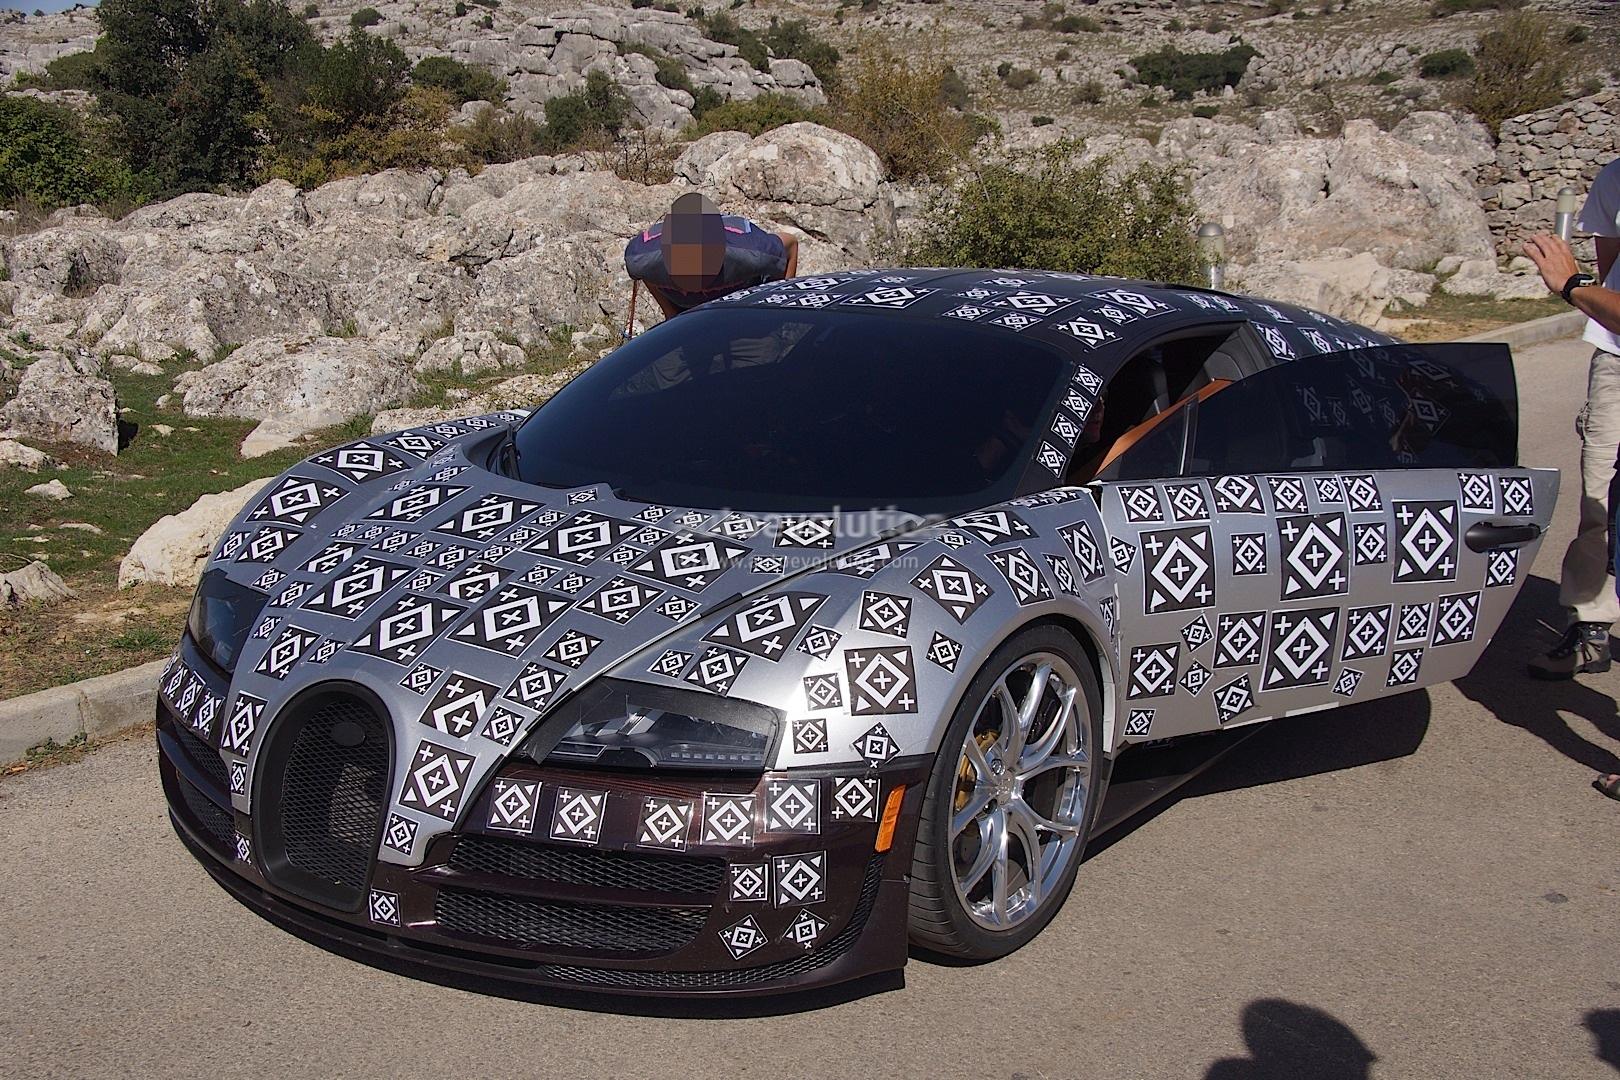 bugatti veyron successor chiron spied testing hybrid power autoevolution - Bugatti 2016 Gold